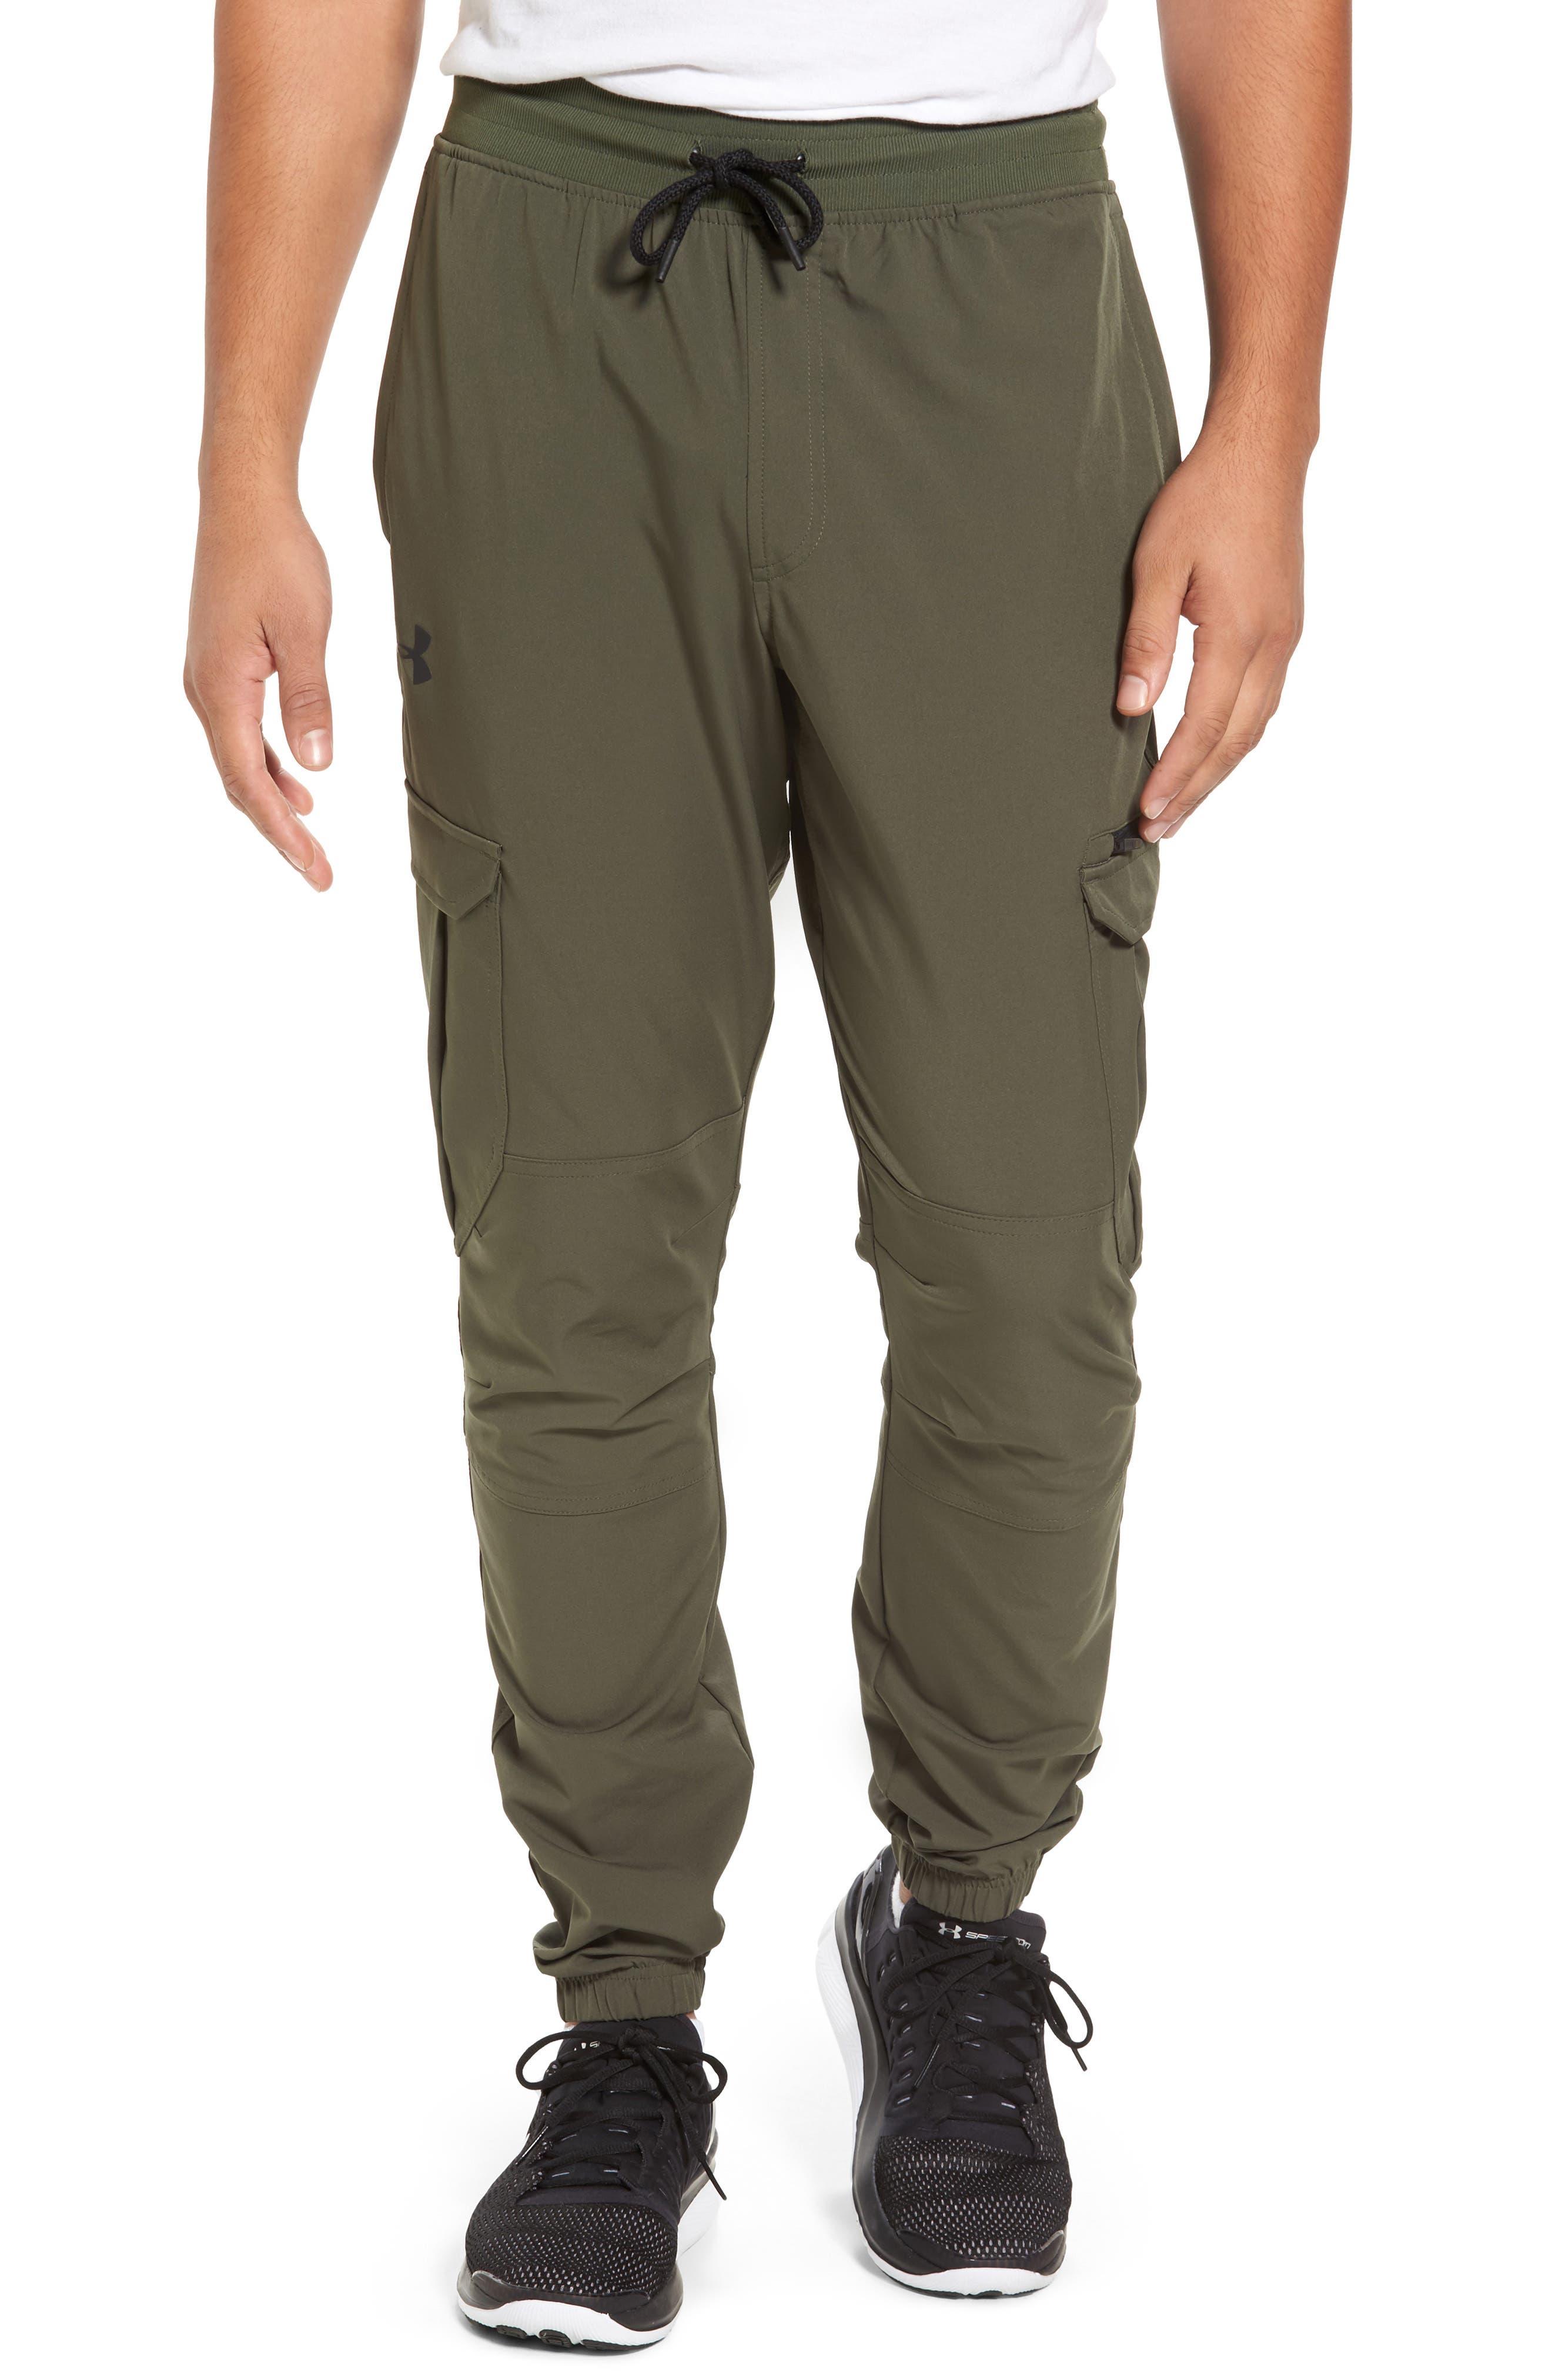 Under Armour Performance Cargo Pants